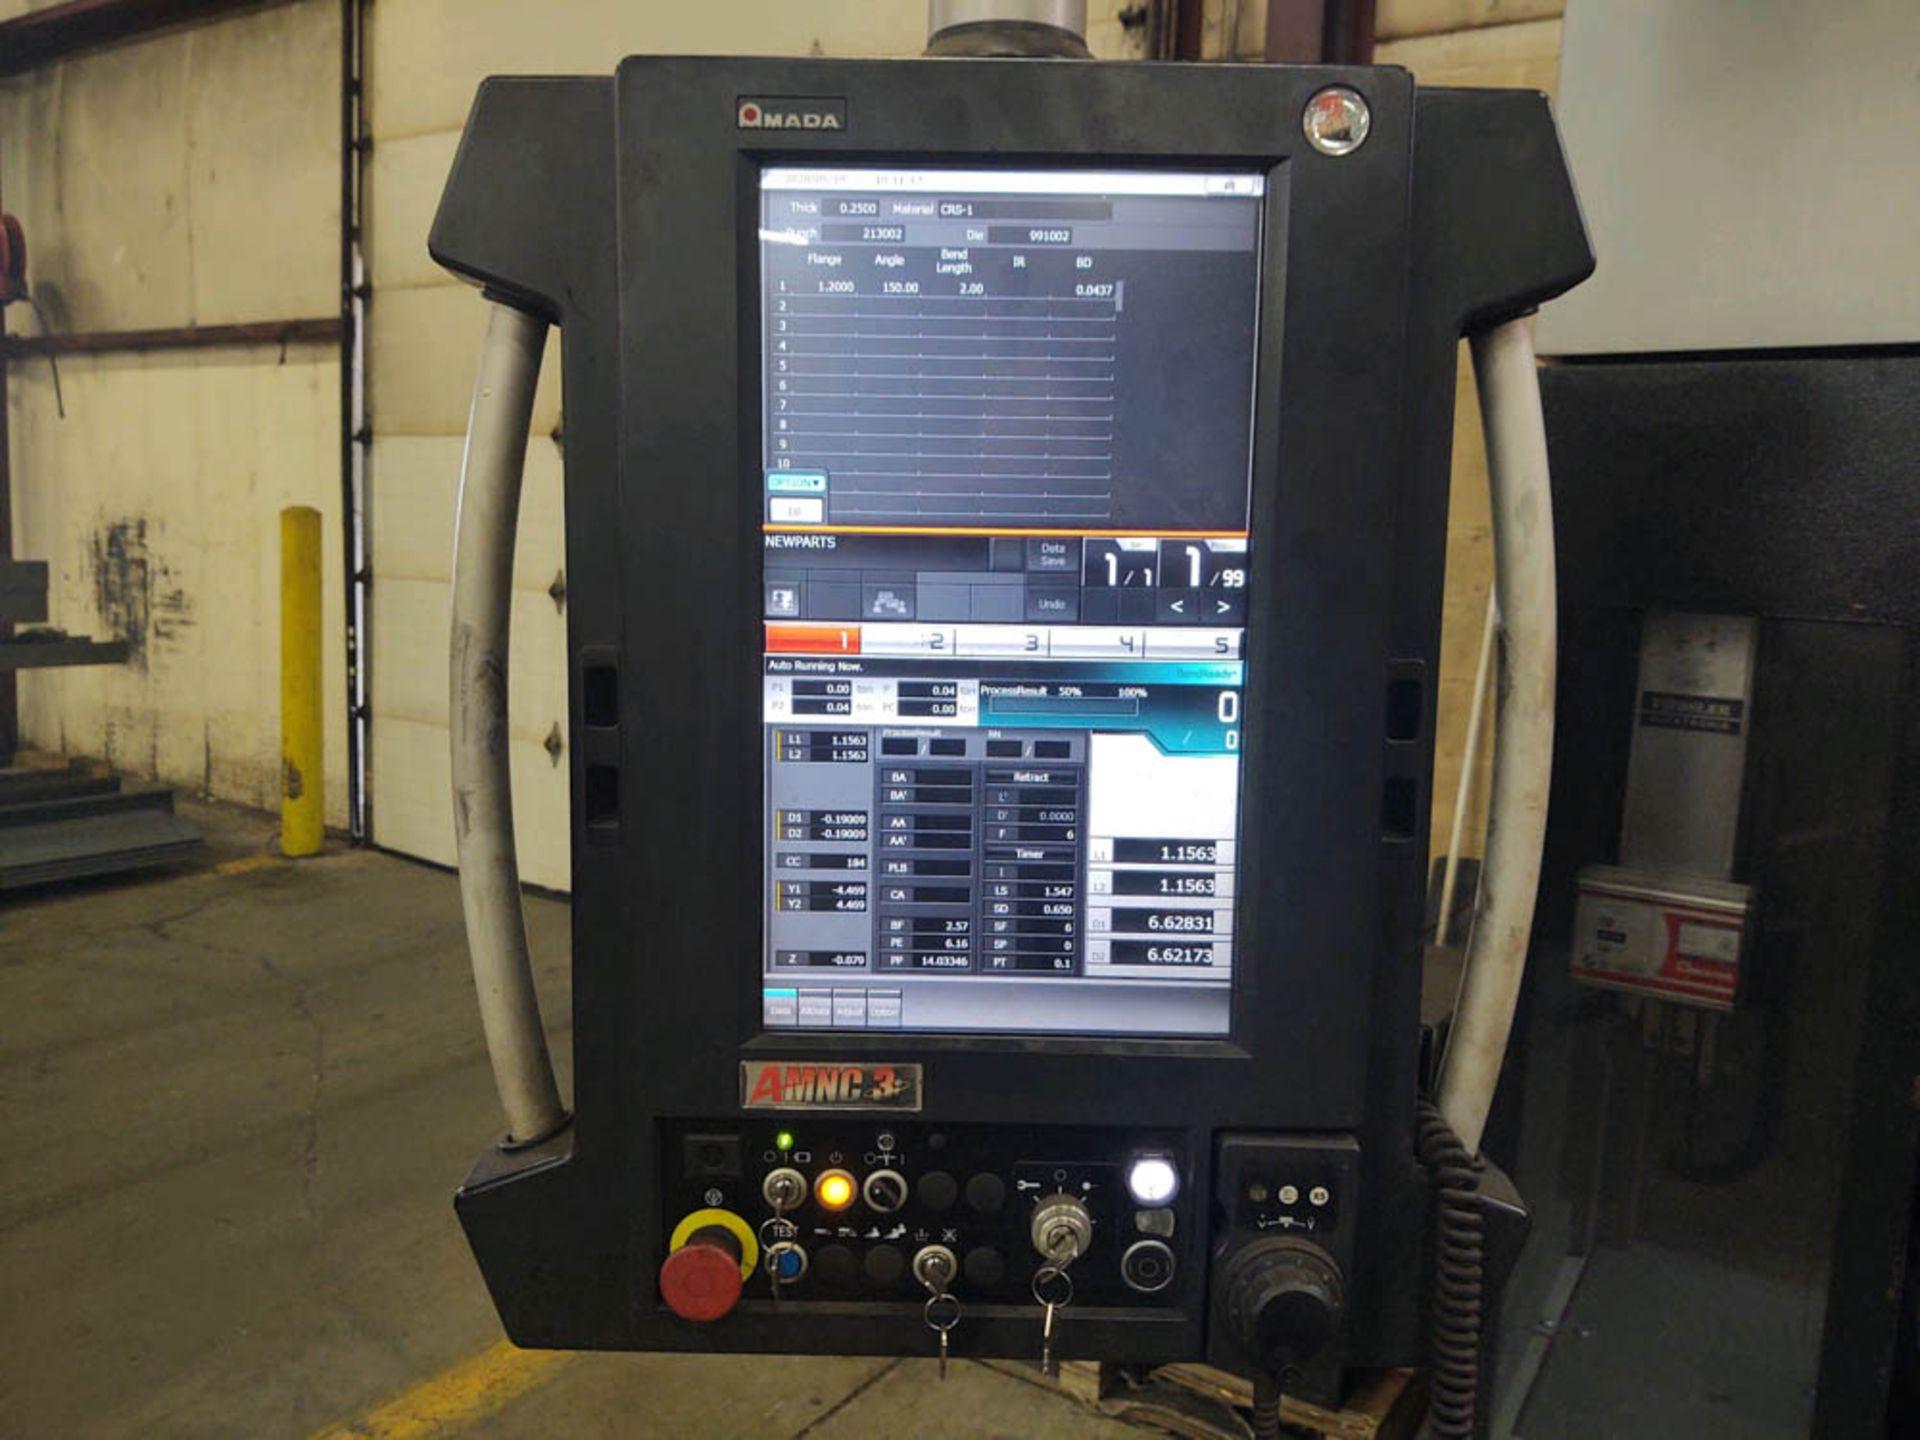 "2015 187 US TON X 122"" AMADA MDL. HG1703 CNC PRESS BRAKE, AMNC 3i CONTROL, 122"" MAX BEND LENGTH - Image 2 of 14"